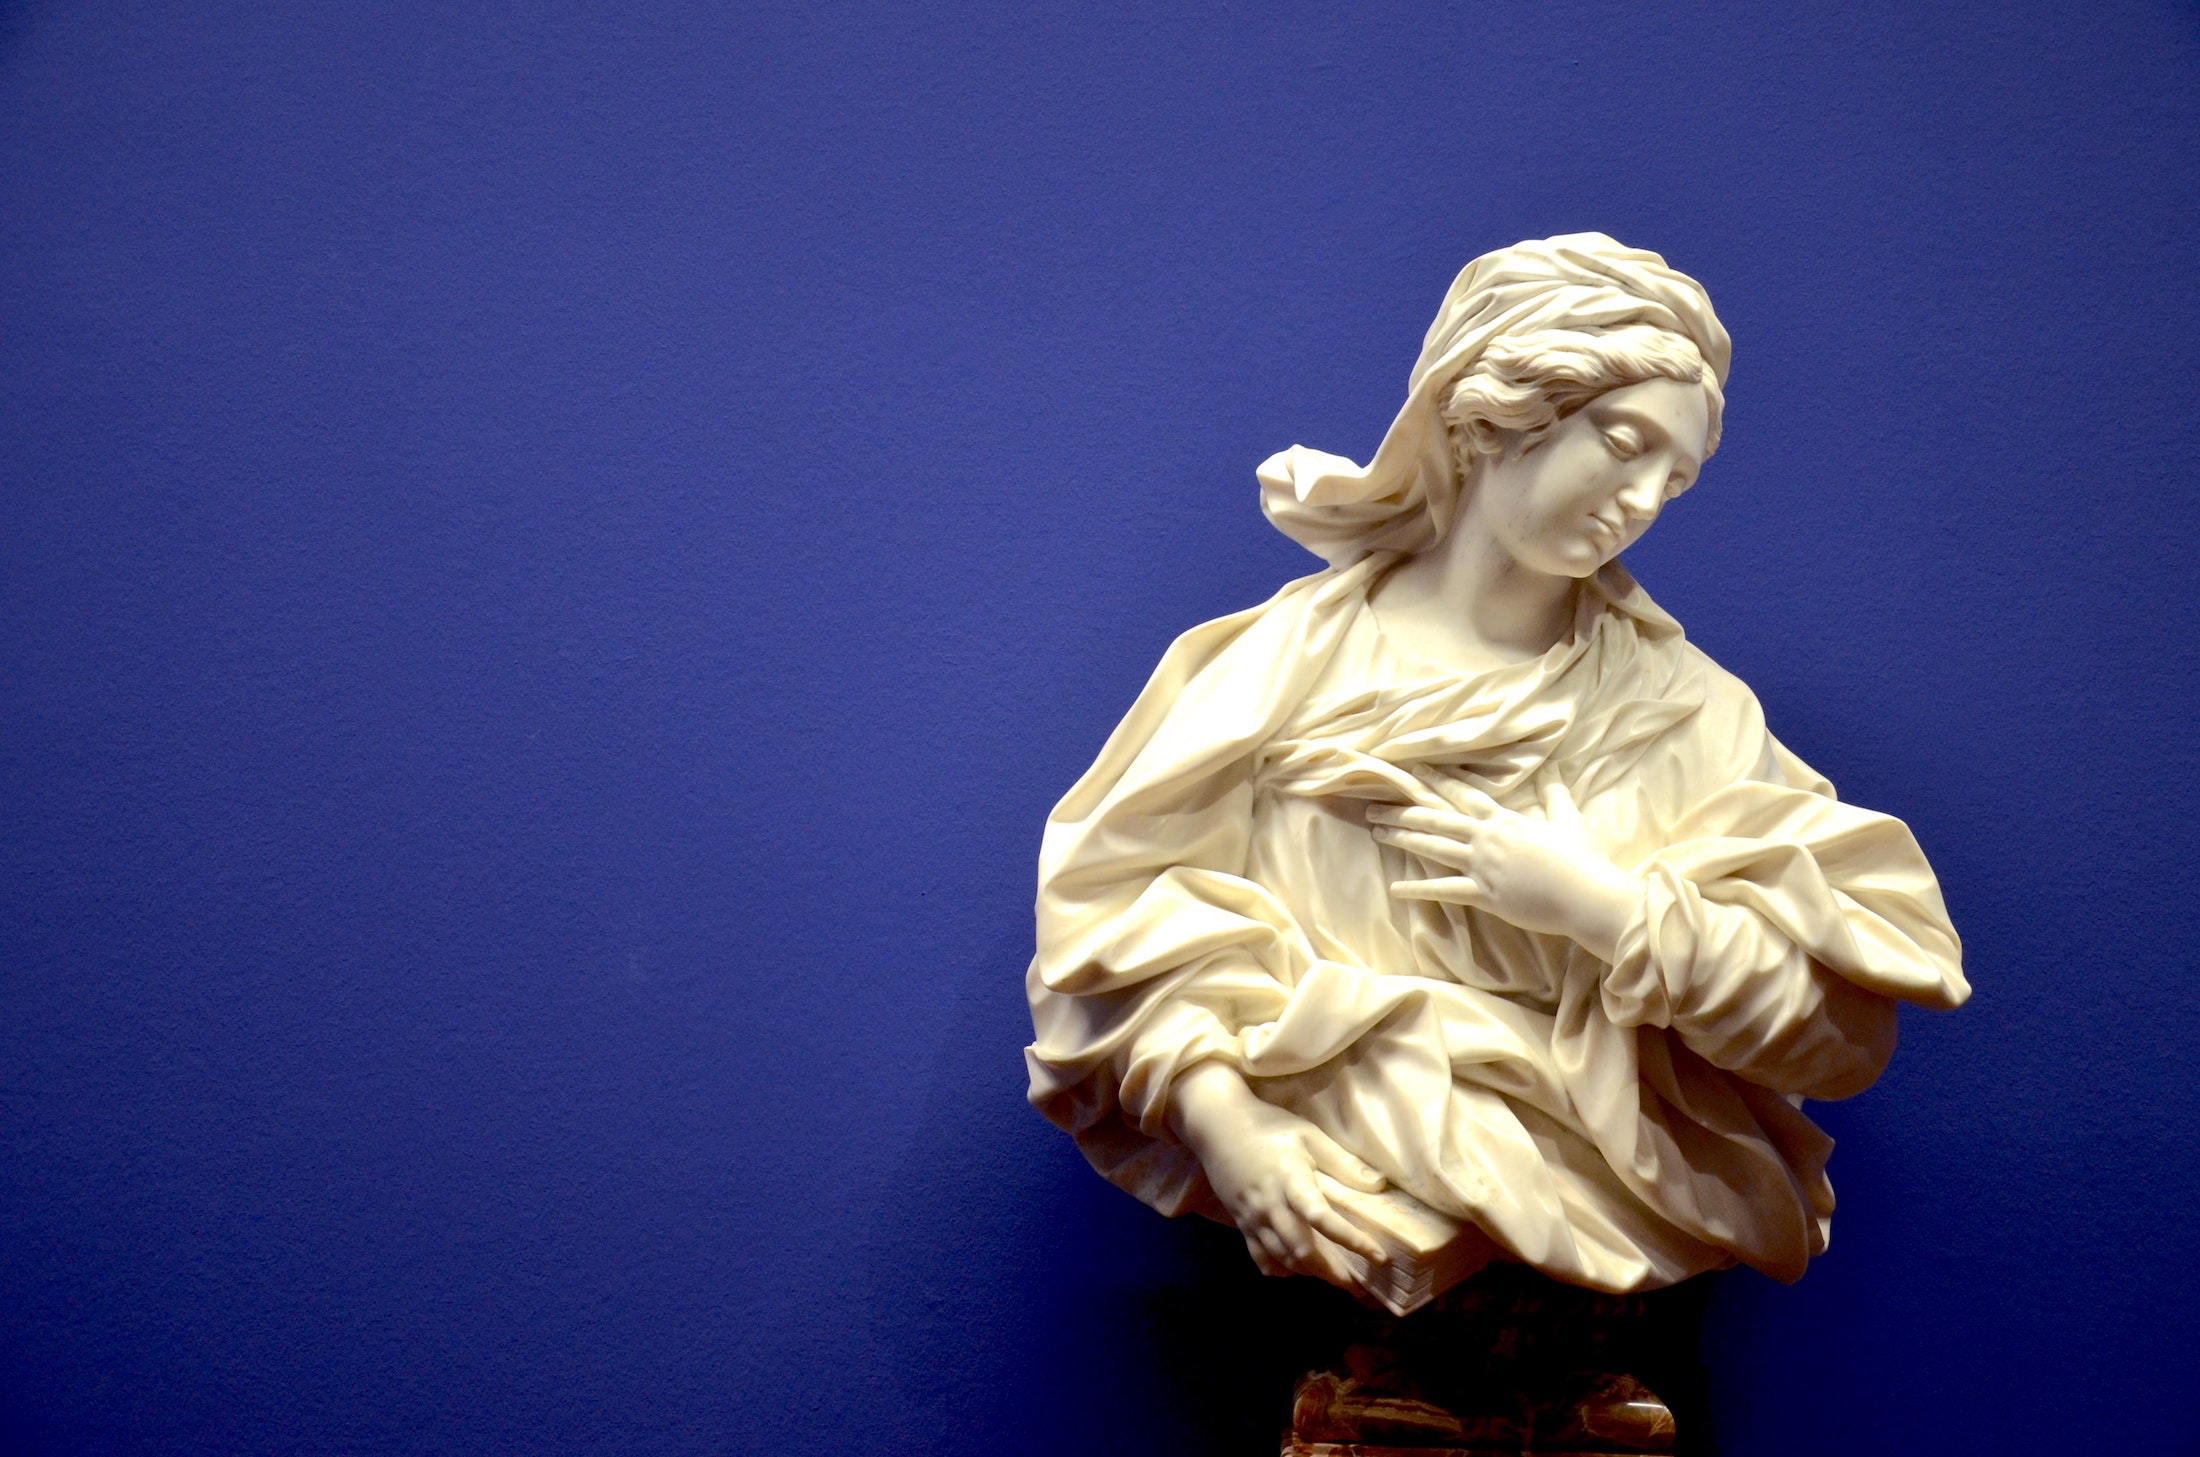 sculpture at a new museum exhibit at the albertina